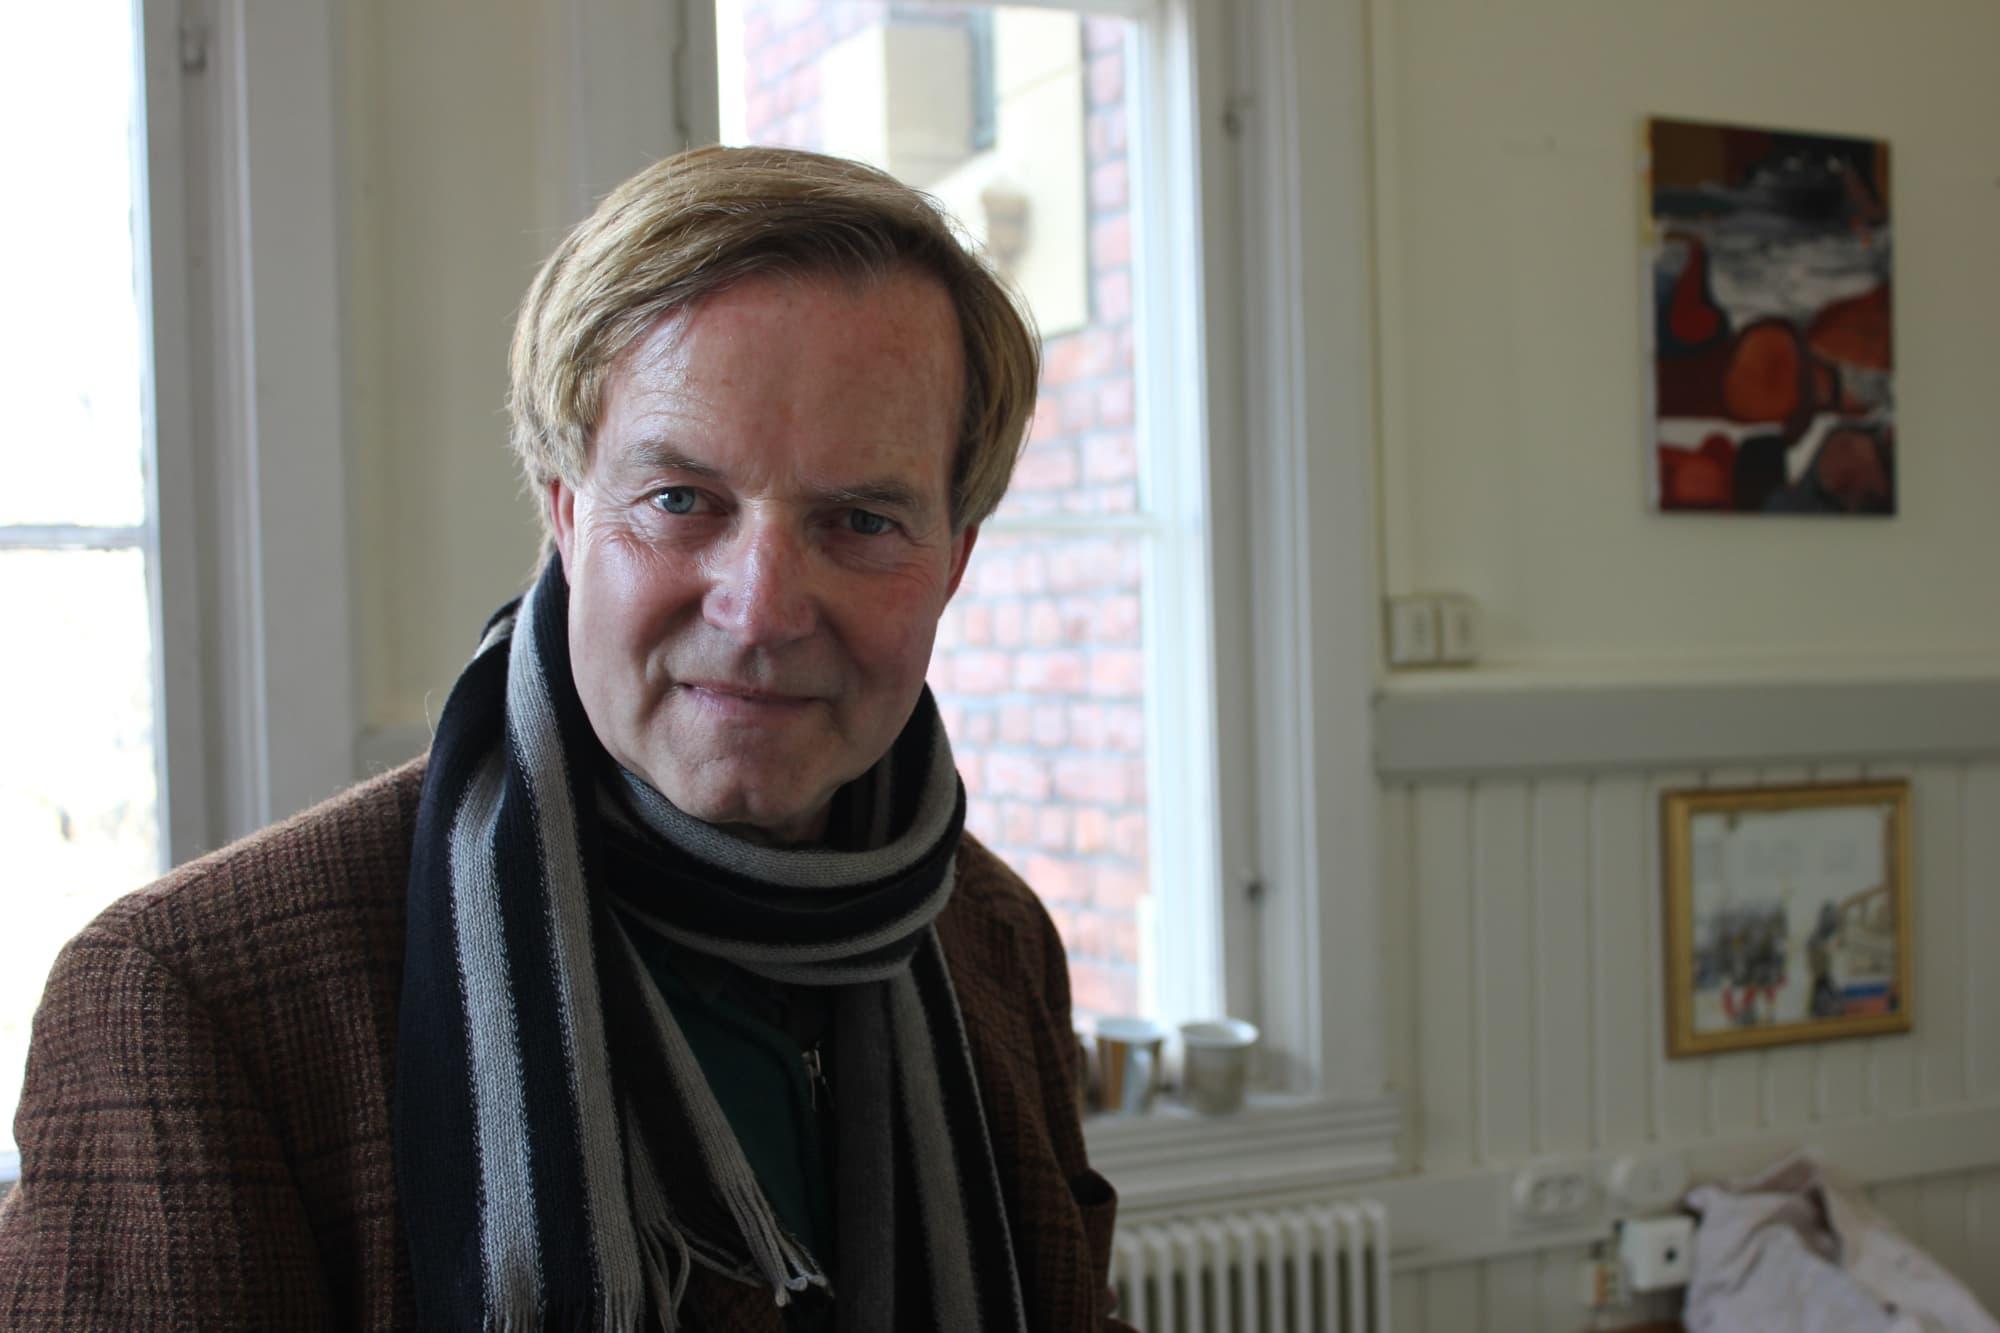 Kjetil Skøien & Julian Skar: Lost Rooms (WP)